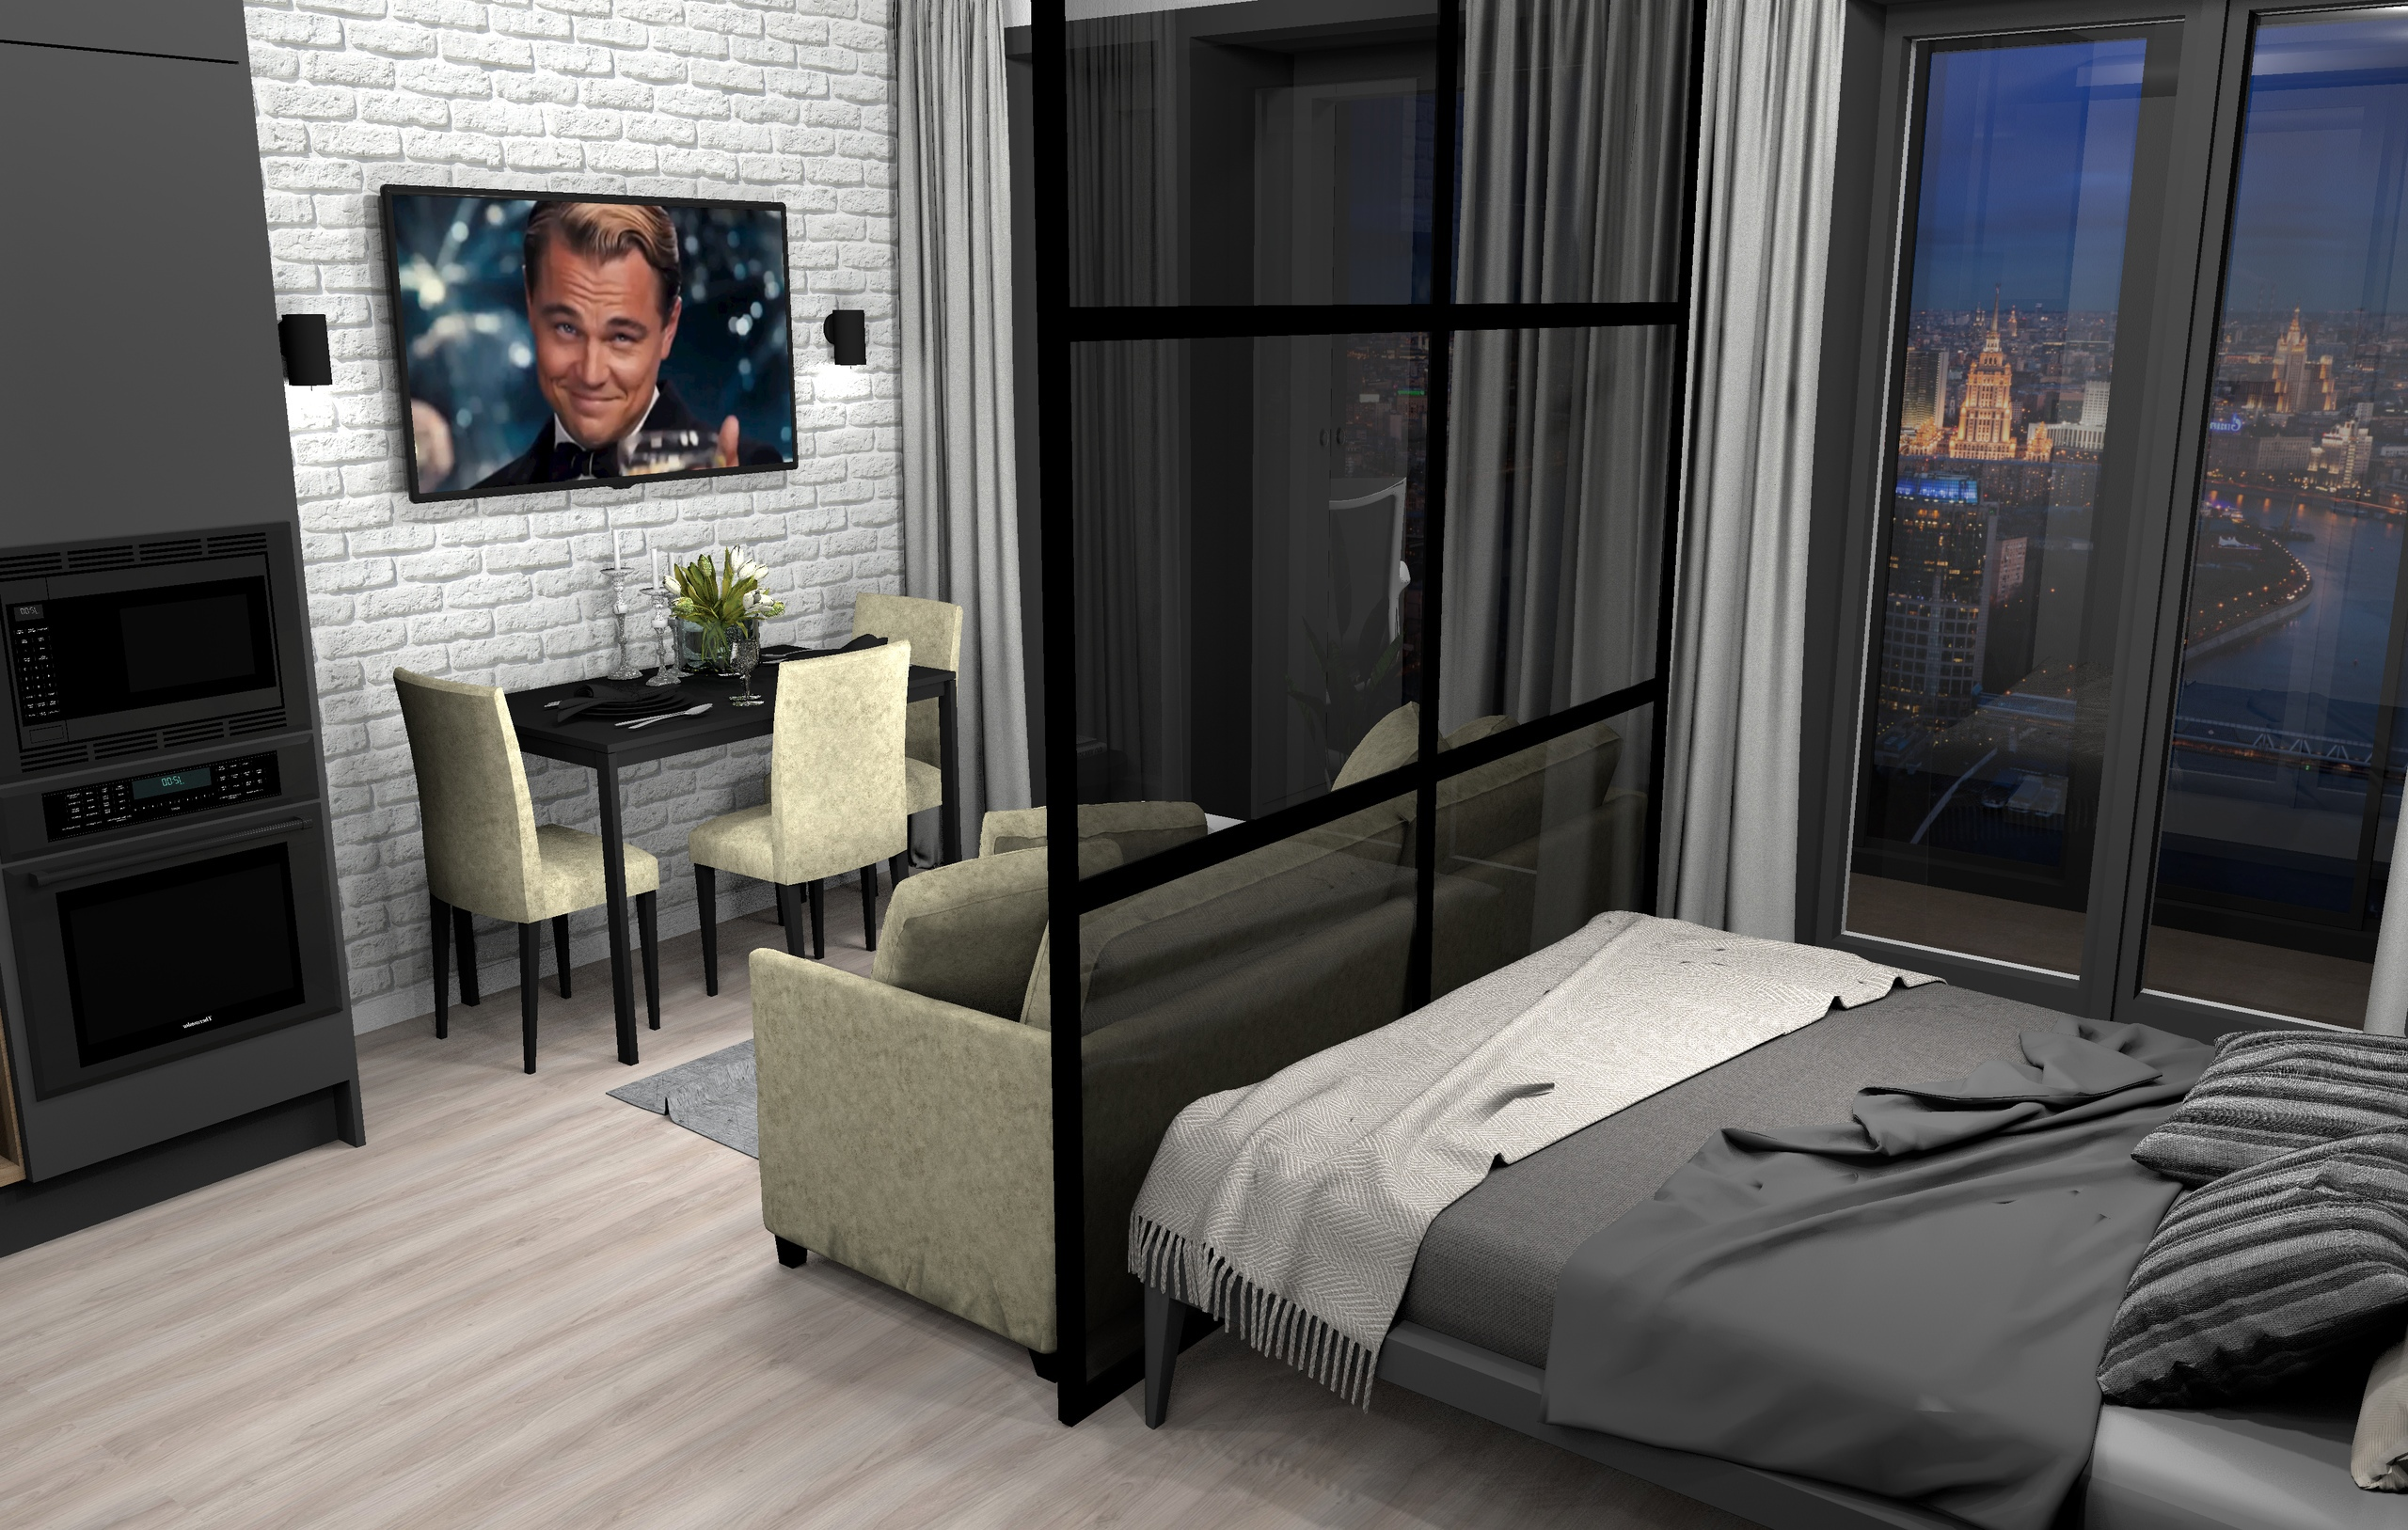 ЖК HEADLINER Москва , проект апартаментов 34 кв/м , автор проекта Чупов А.